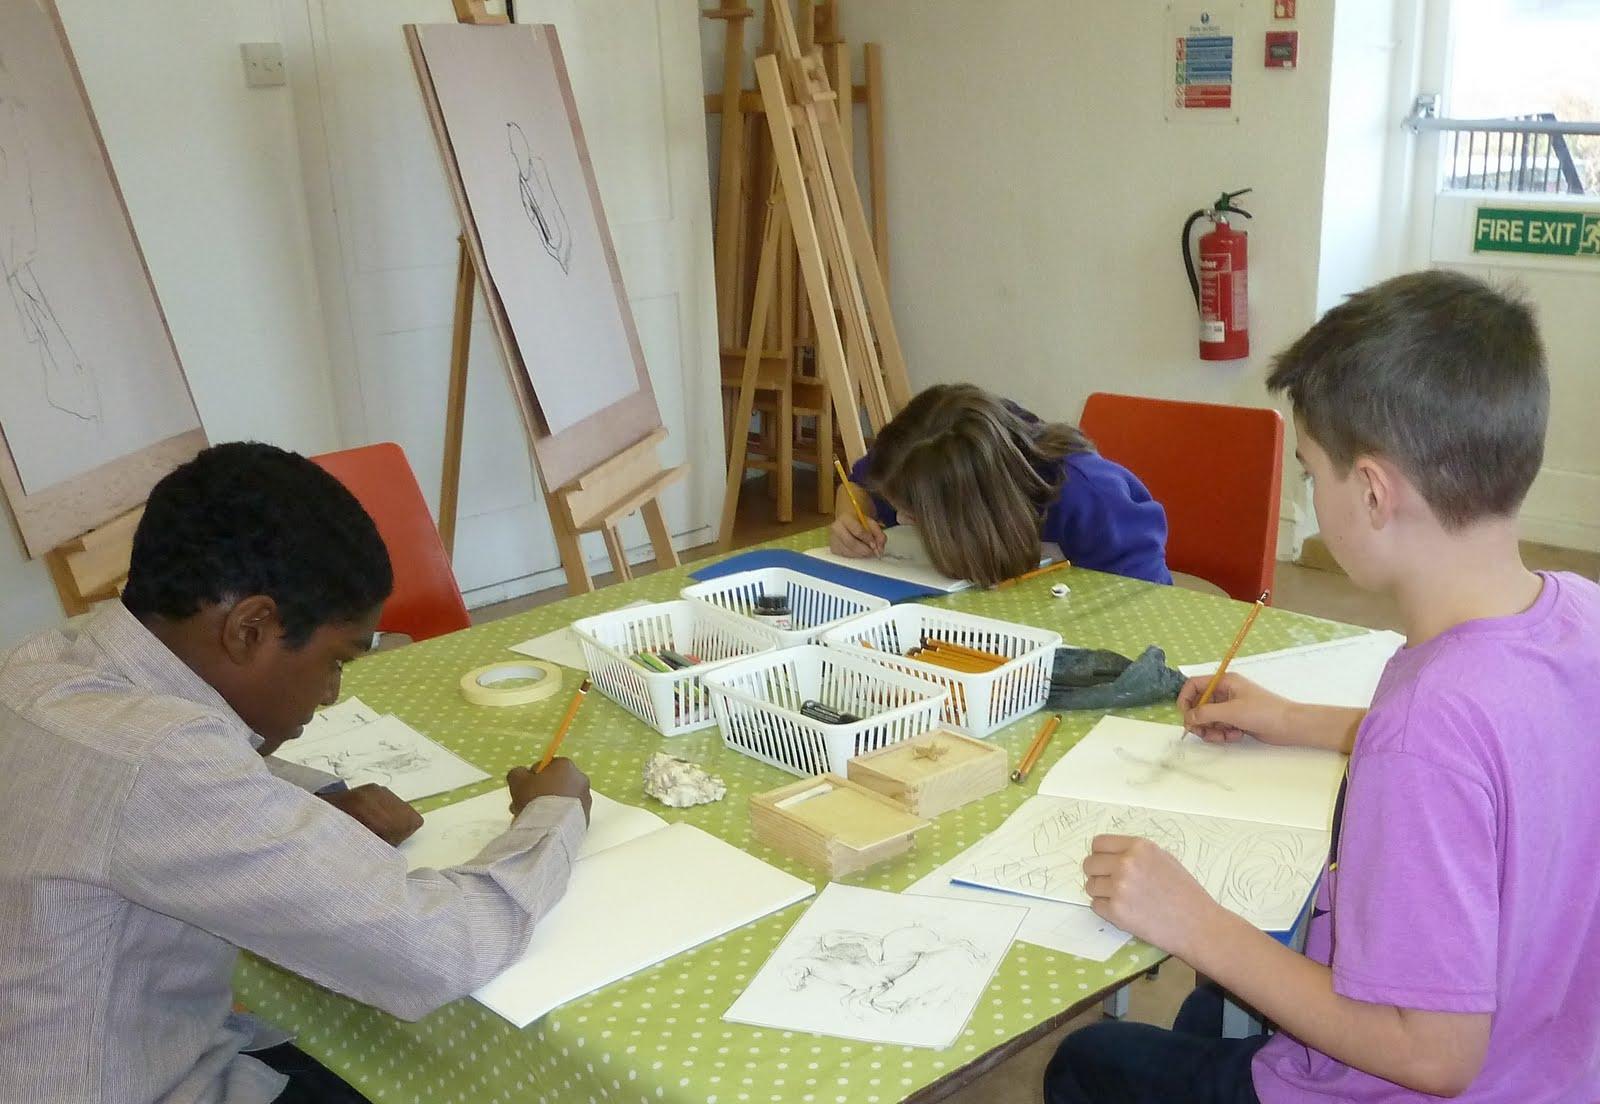 Line Drawing Ks2 : South east school of art work in progress ks drawing week